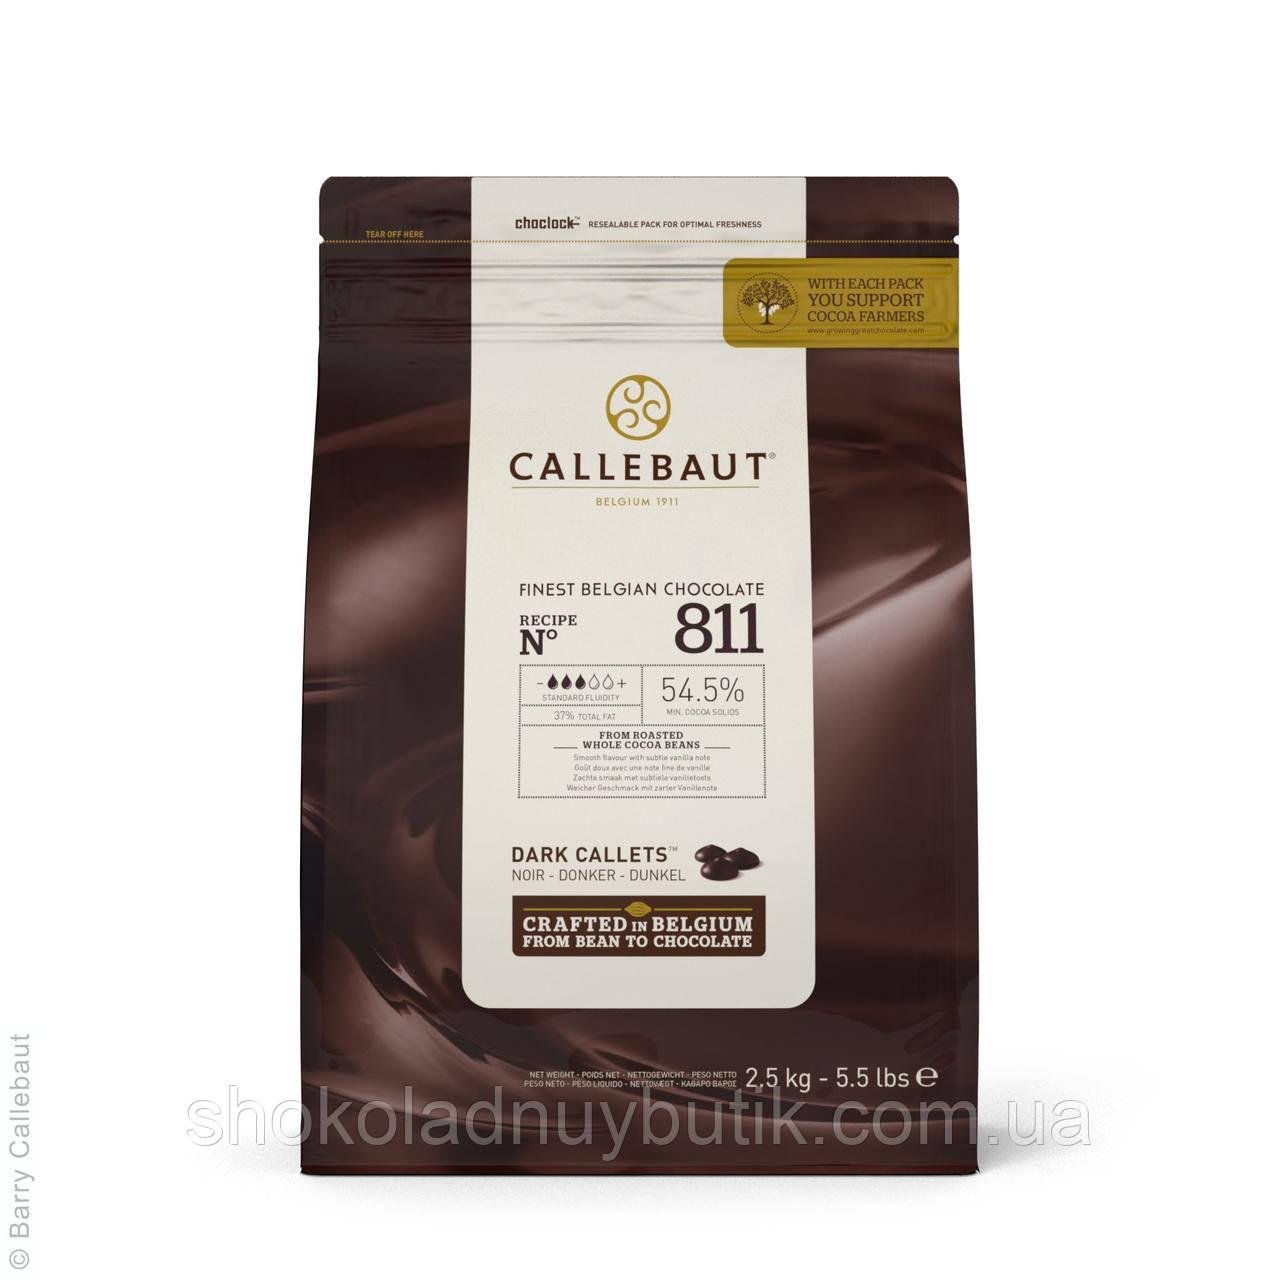 Чорний шоколад Callebaut 55% 2,5кг.